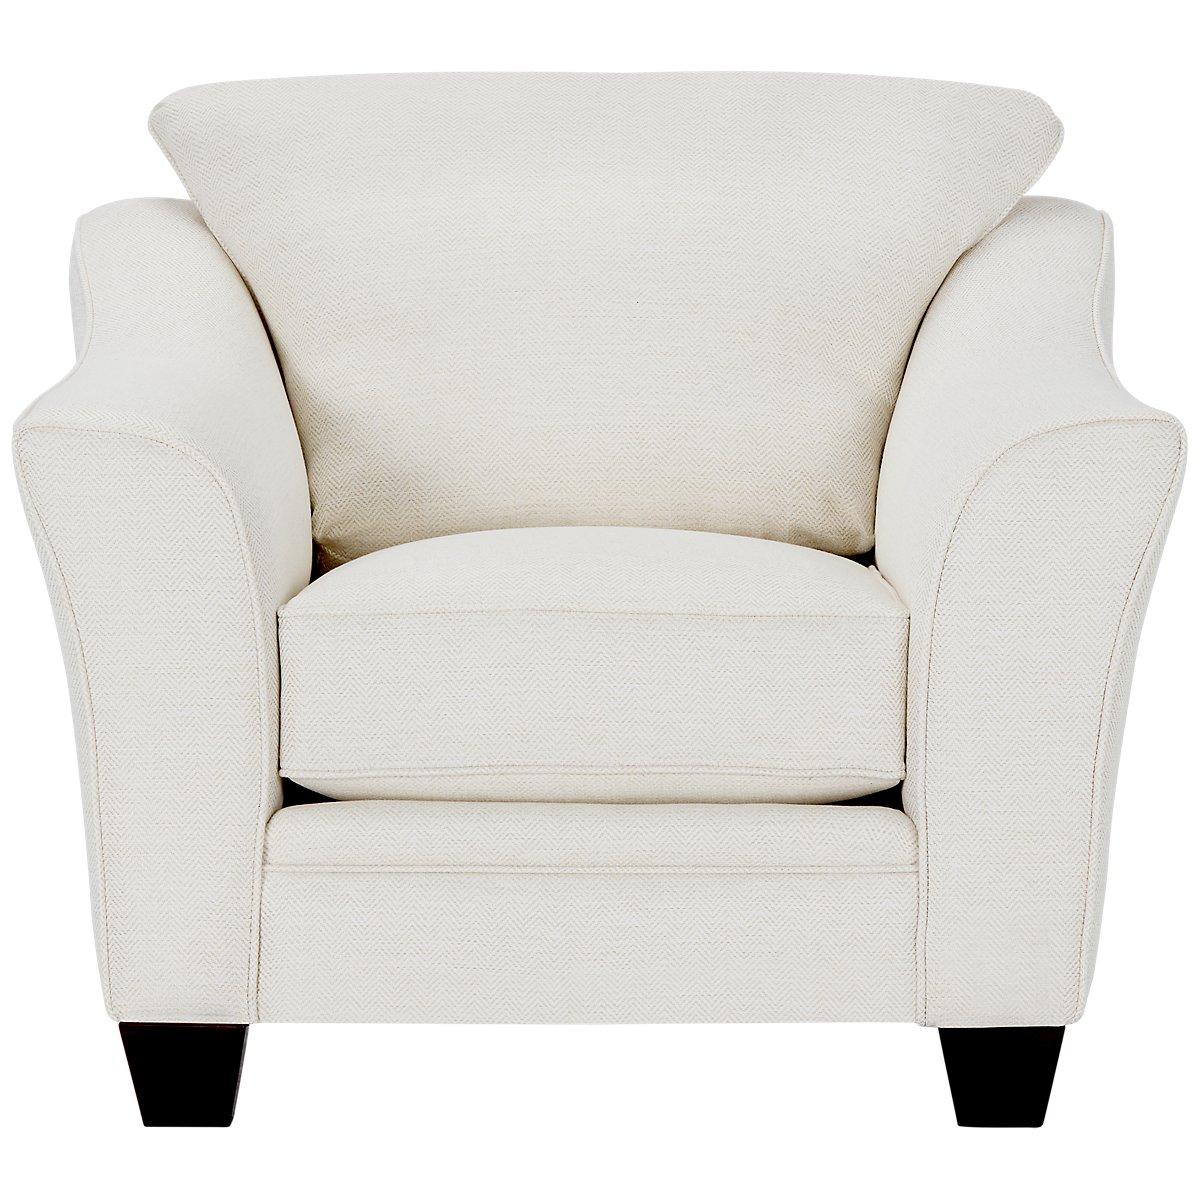 Avery White Fabric Chair